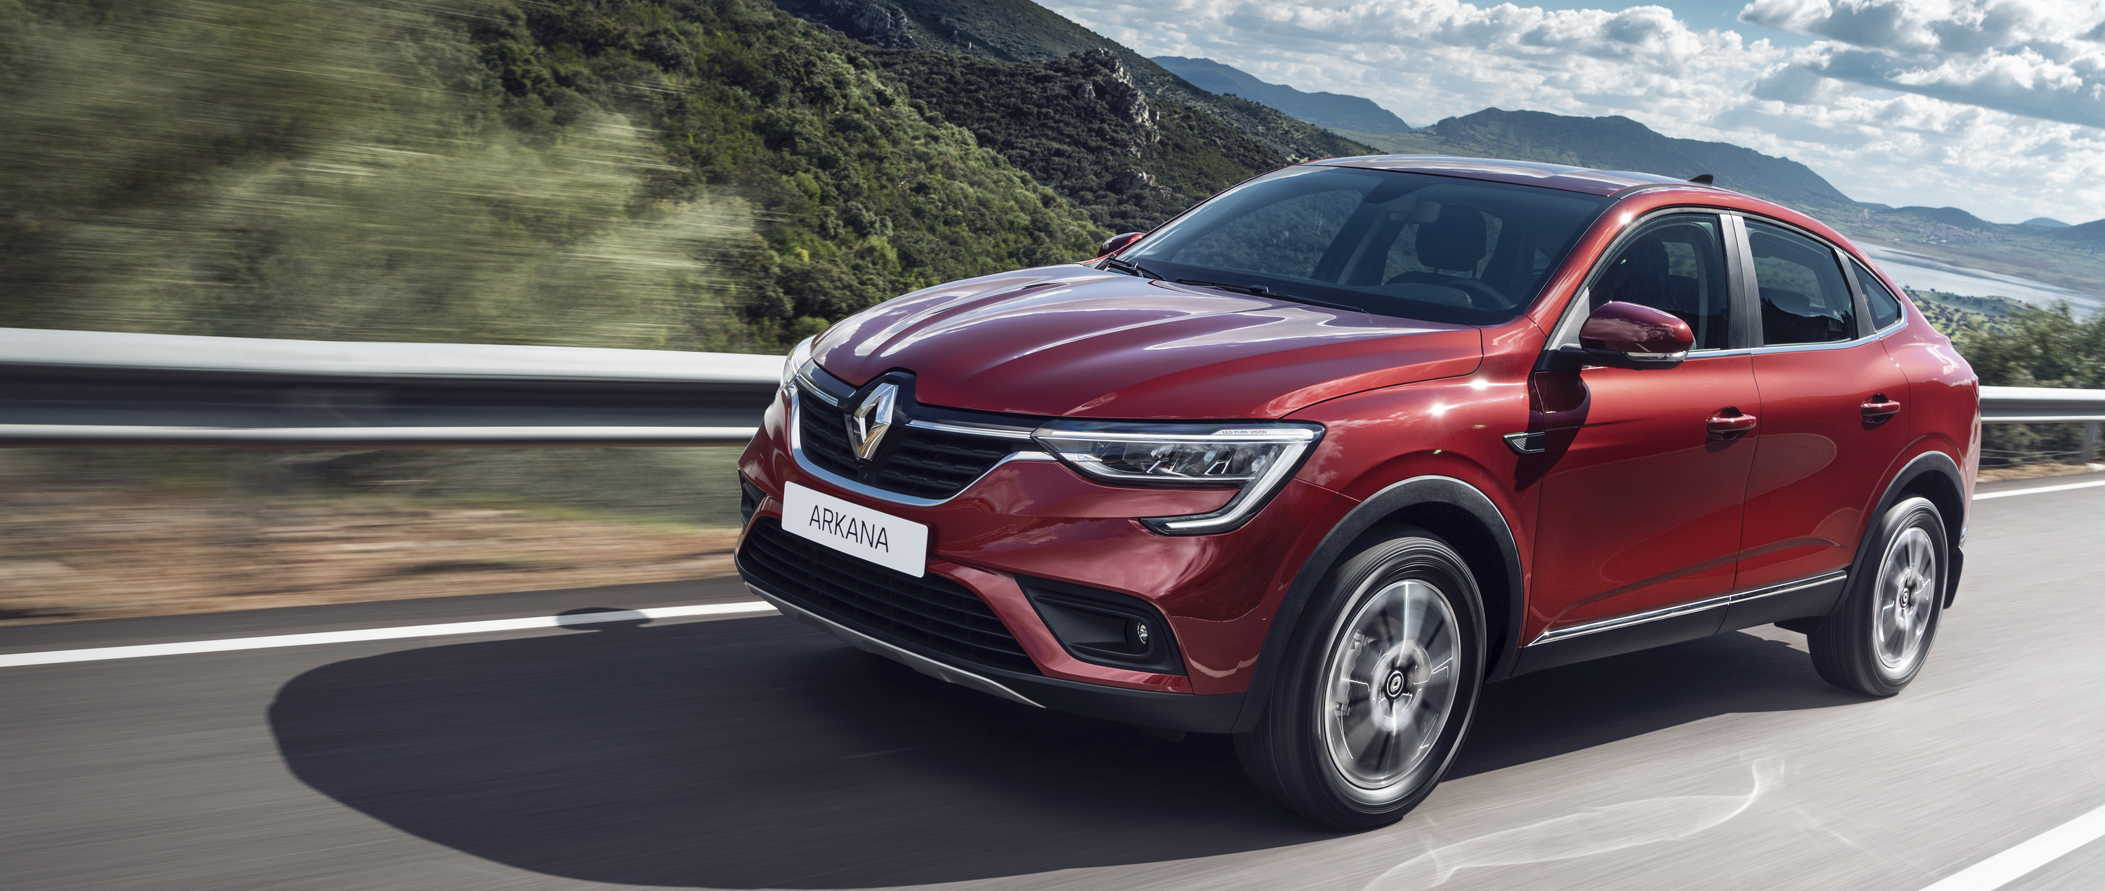 НОВИЙ Renault ARKANA  фото 3